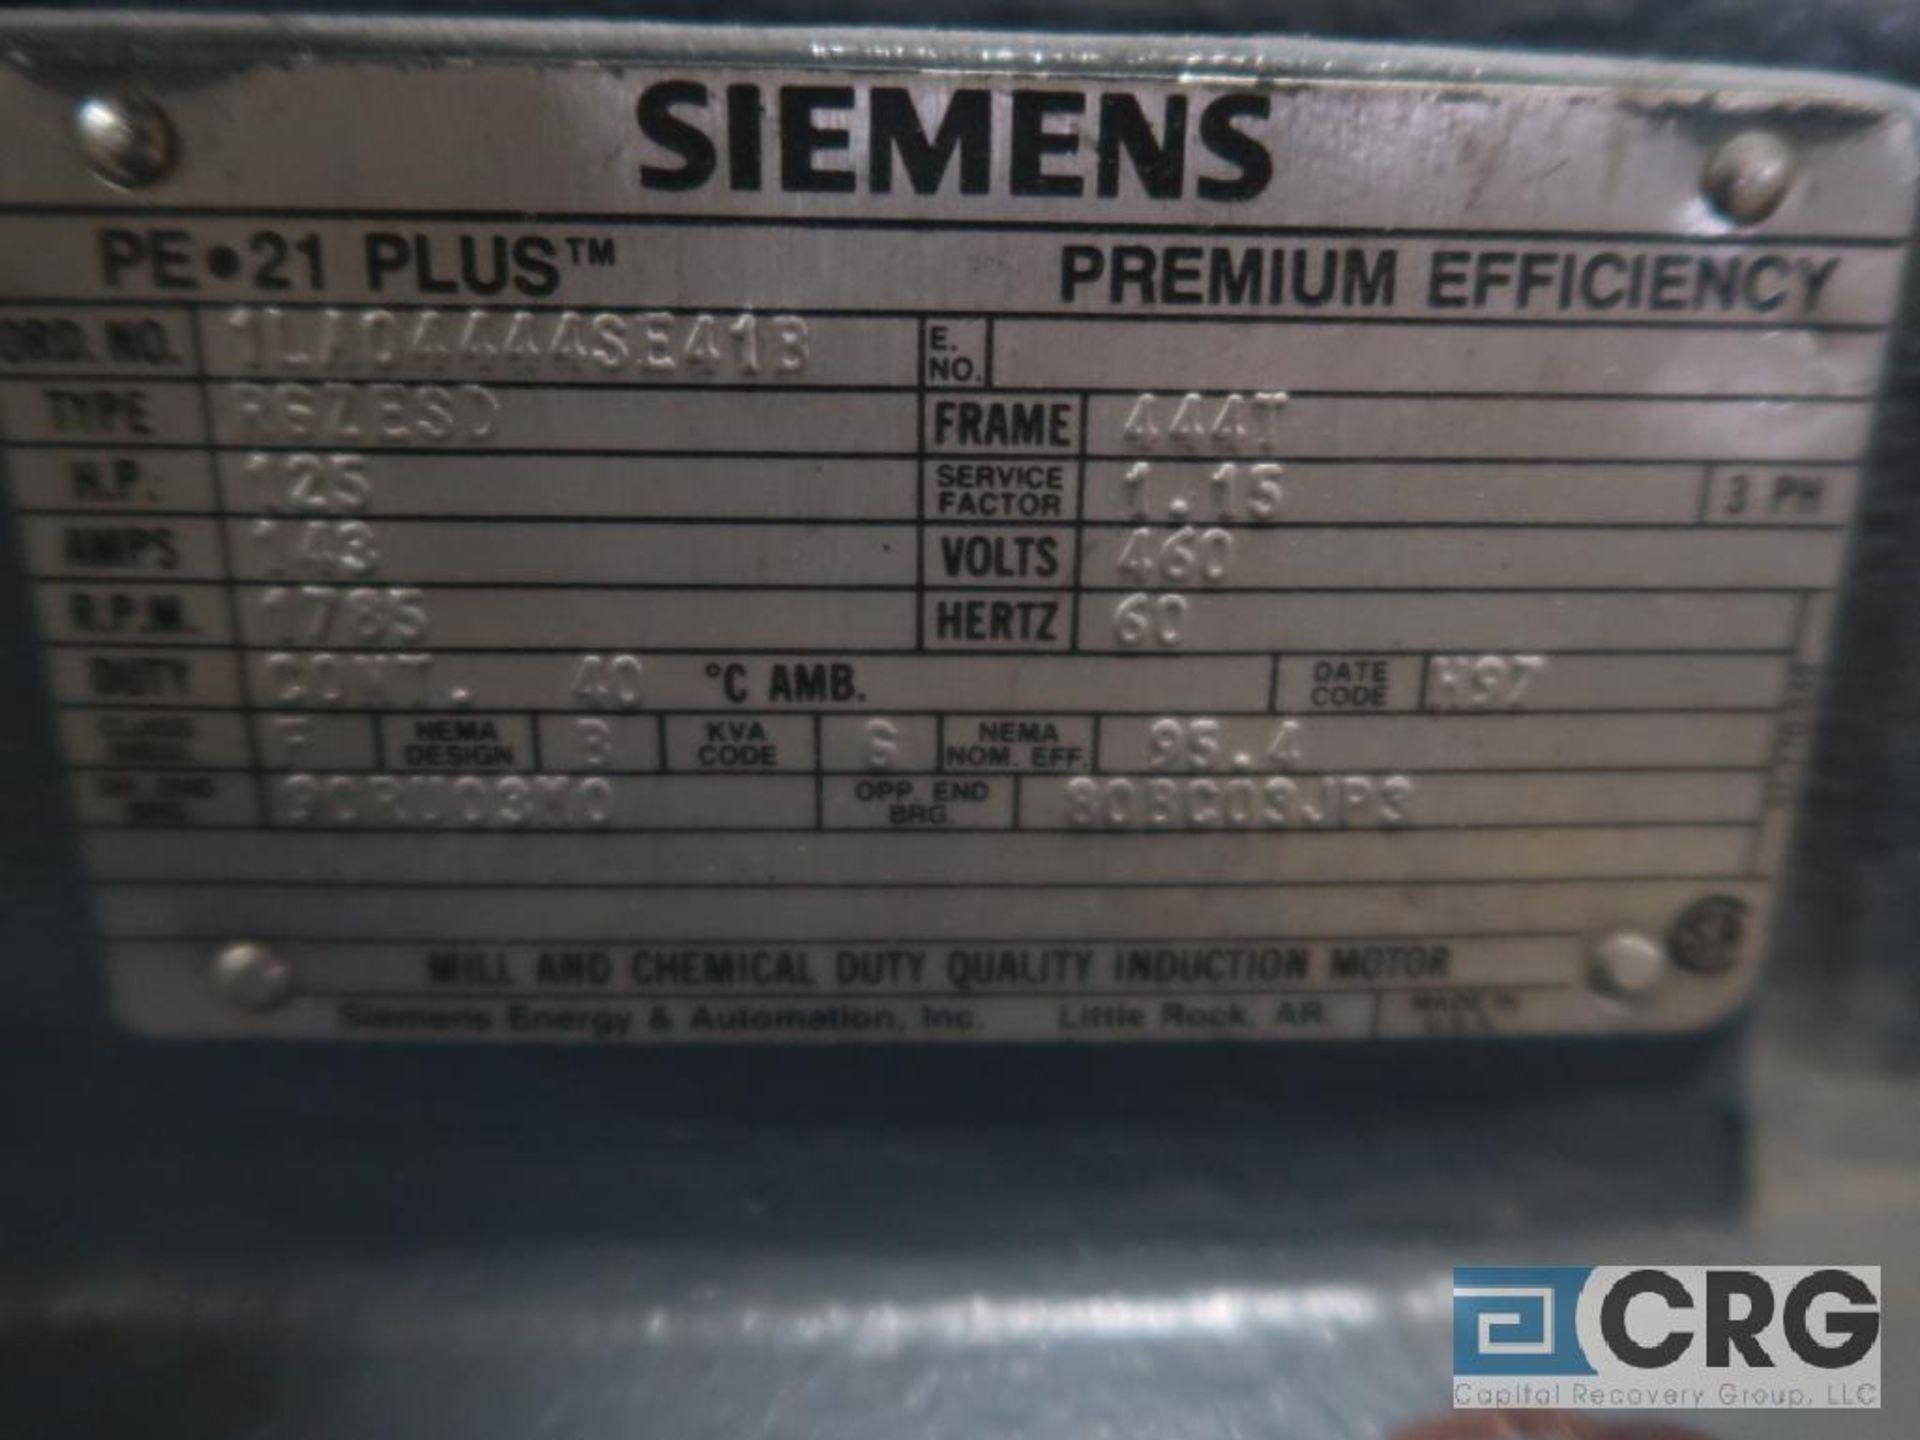 Siemens Premium Efficiency 21 PLUS motor, 125 HP, 1,785 RPMs, 460 volt, 3 ph., 444T frame (Finish - Image 2 of 2